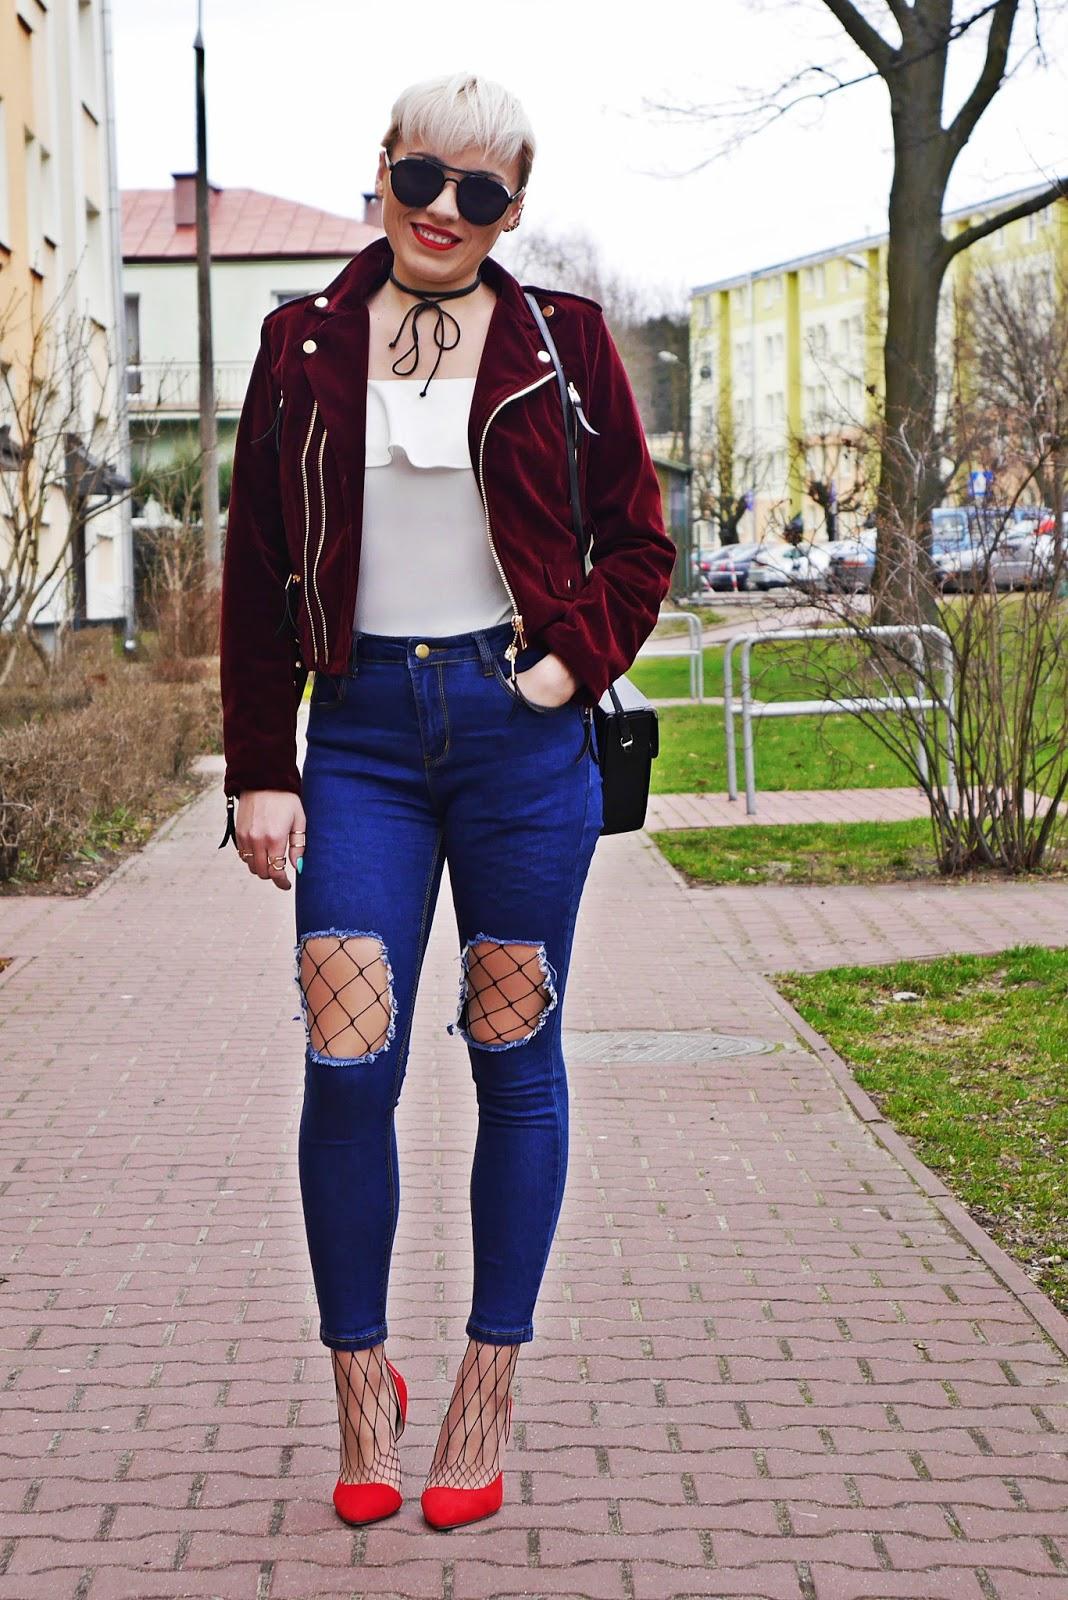 velvet_biker_jacket_burgundy_zaful_karyn_look_ootd_outfit_300317b